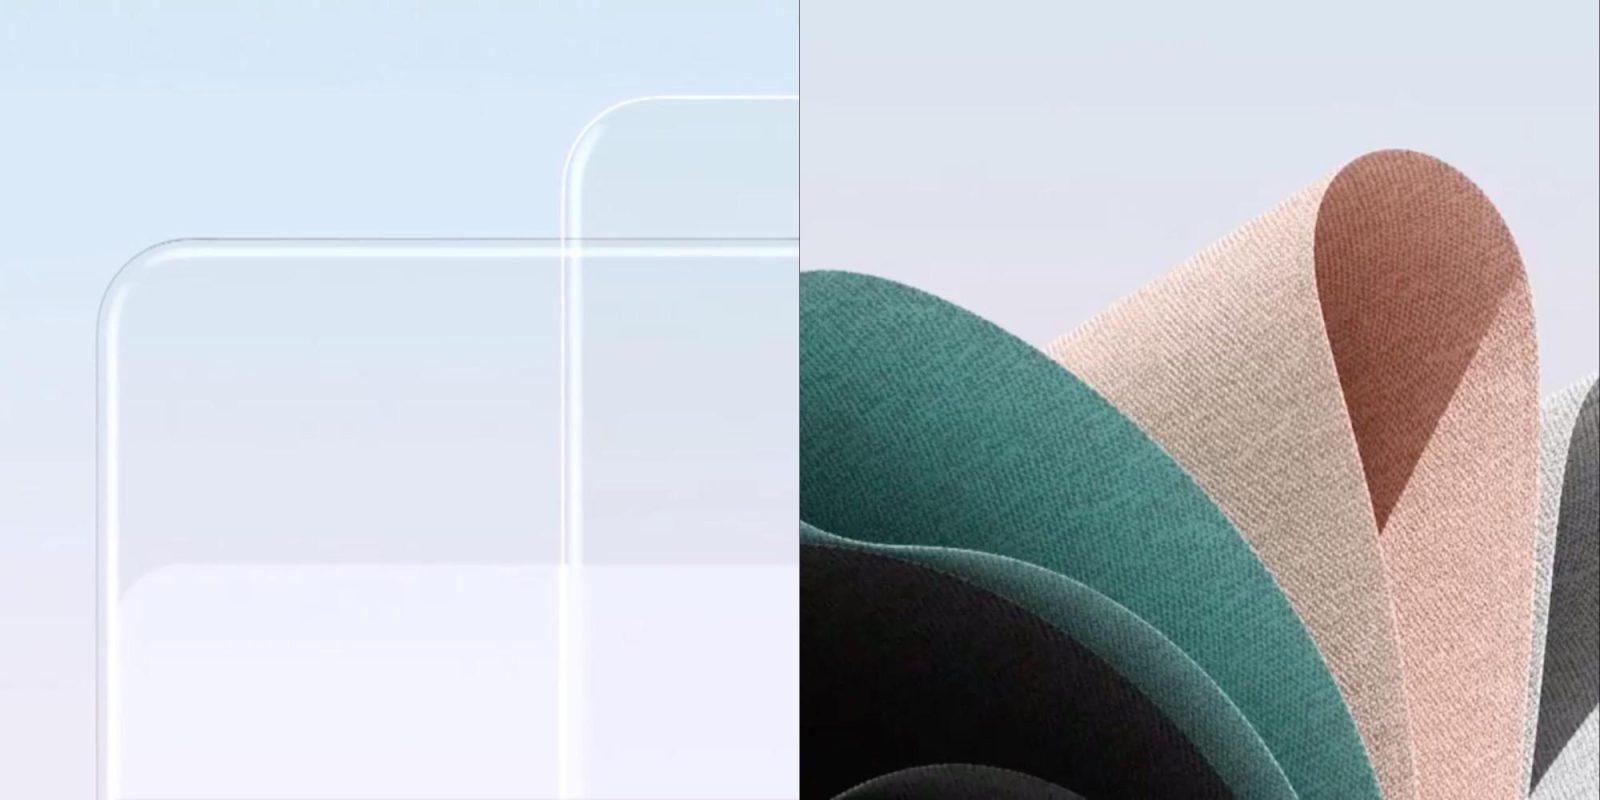 Watch Google's materials design videos for Pixel 3, Nest Hub